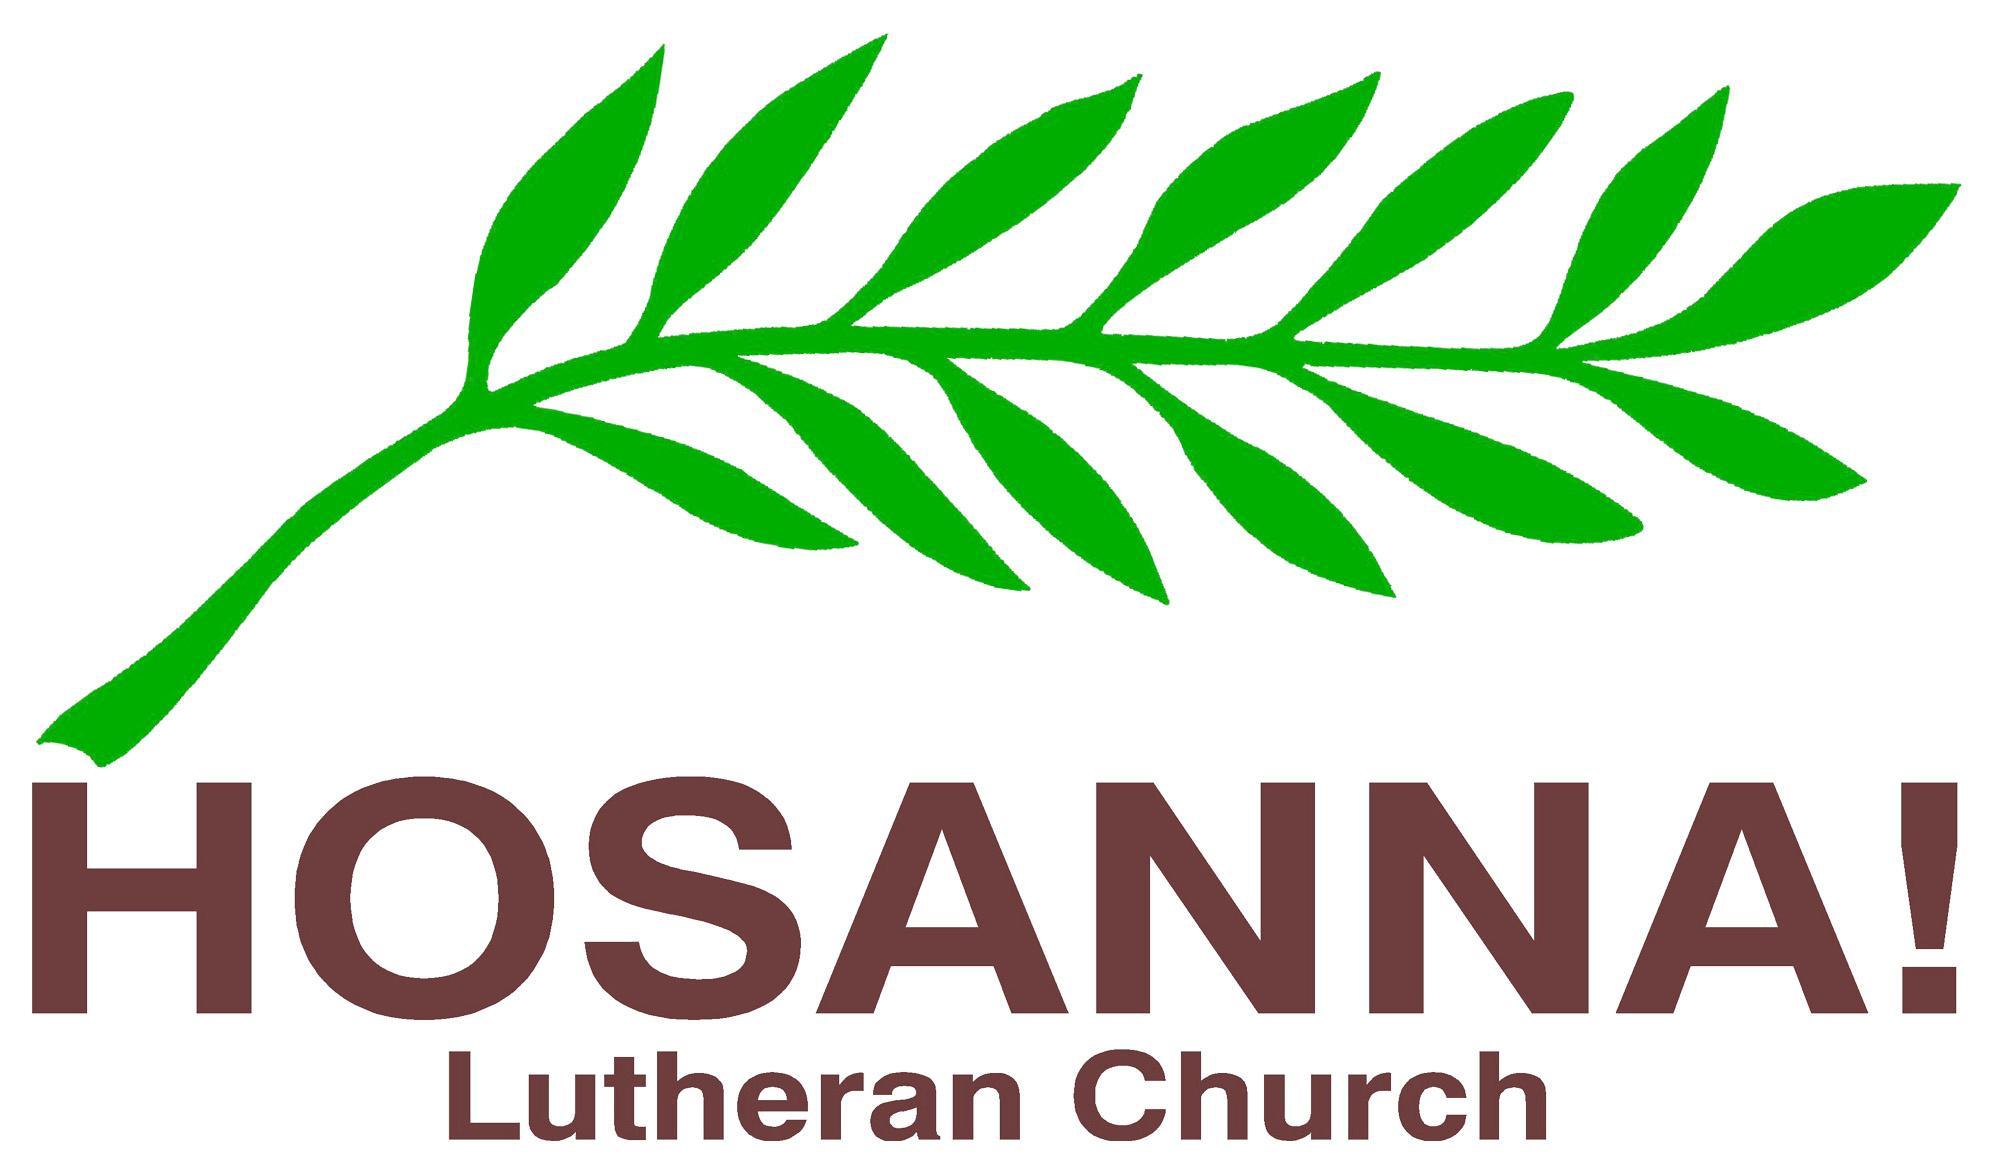 Hosanna! Lutheran Church